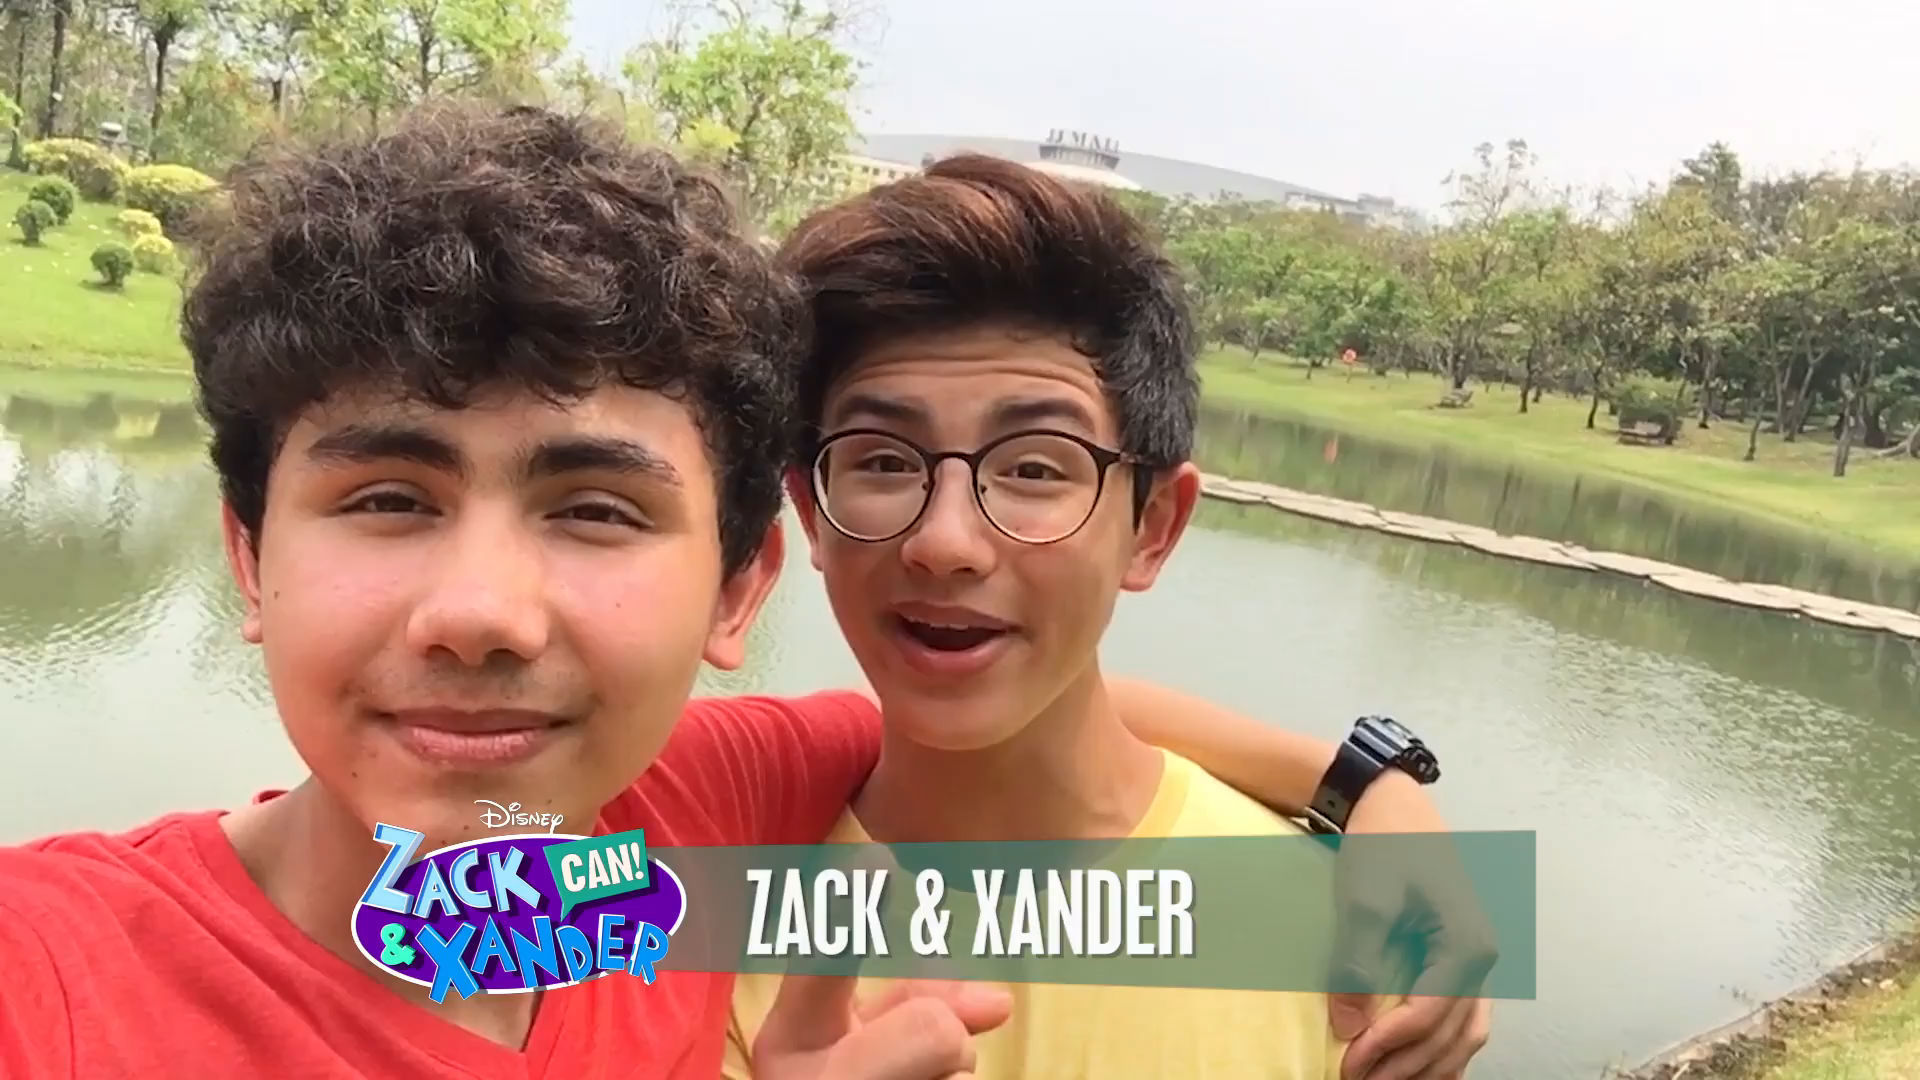 Zack & Xander Greeting 1 | Zack & Xander CAN! Web Series